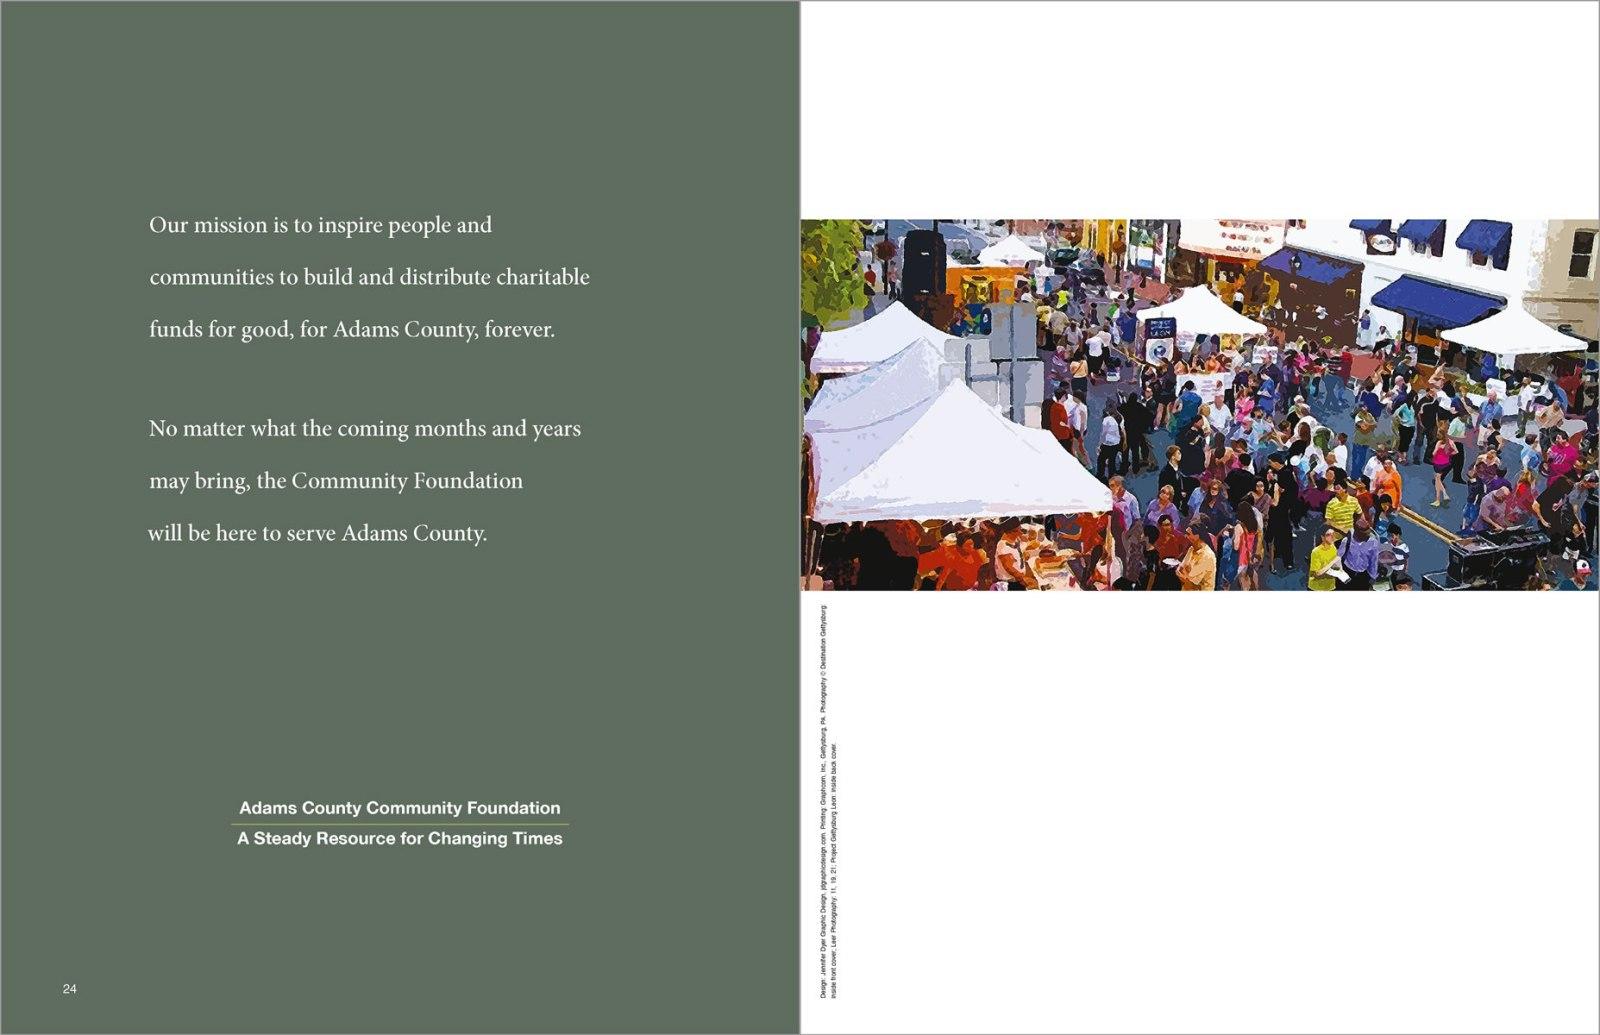 Adams County Community Foundation Annual Report 2020